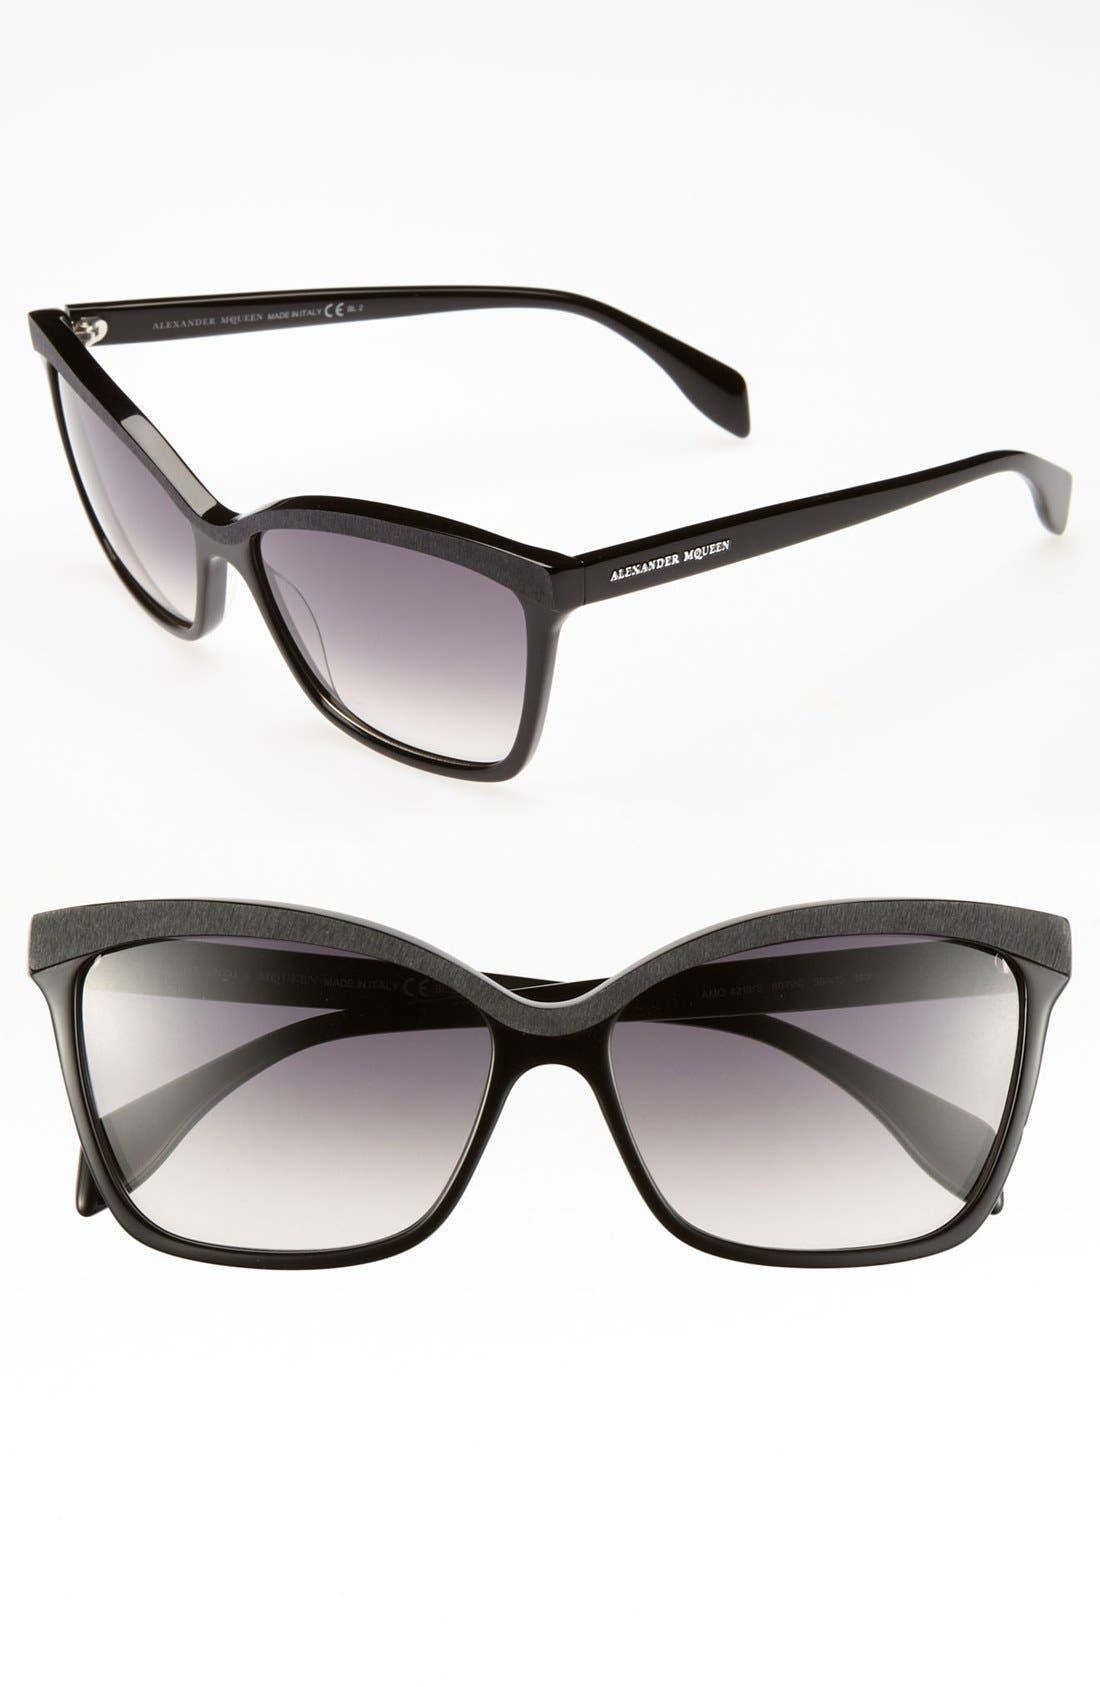 Main Image - Alexander McQueen 58mm 'Retro' Sunglasses (Online Only)